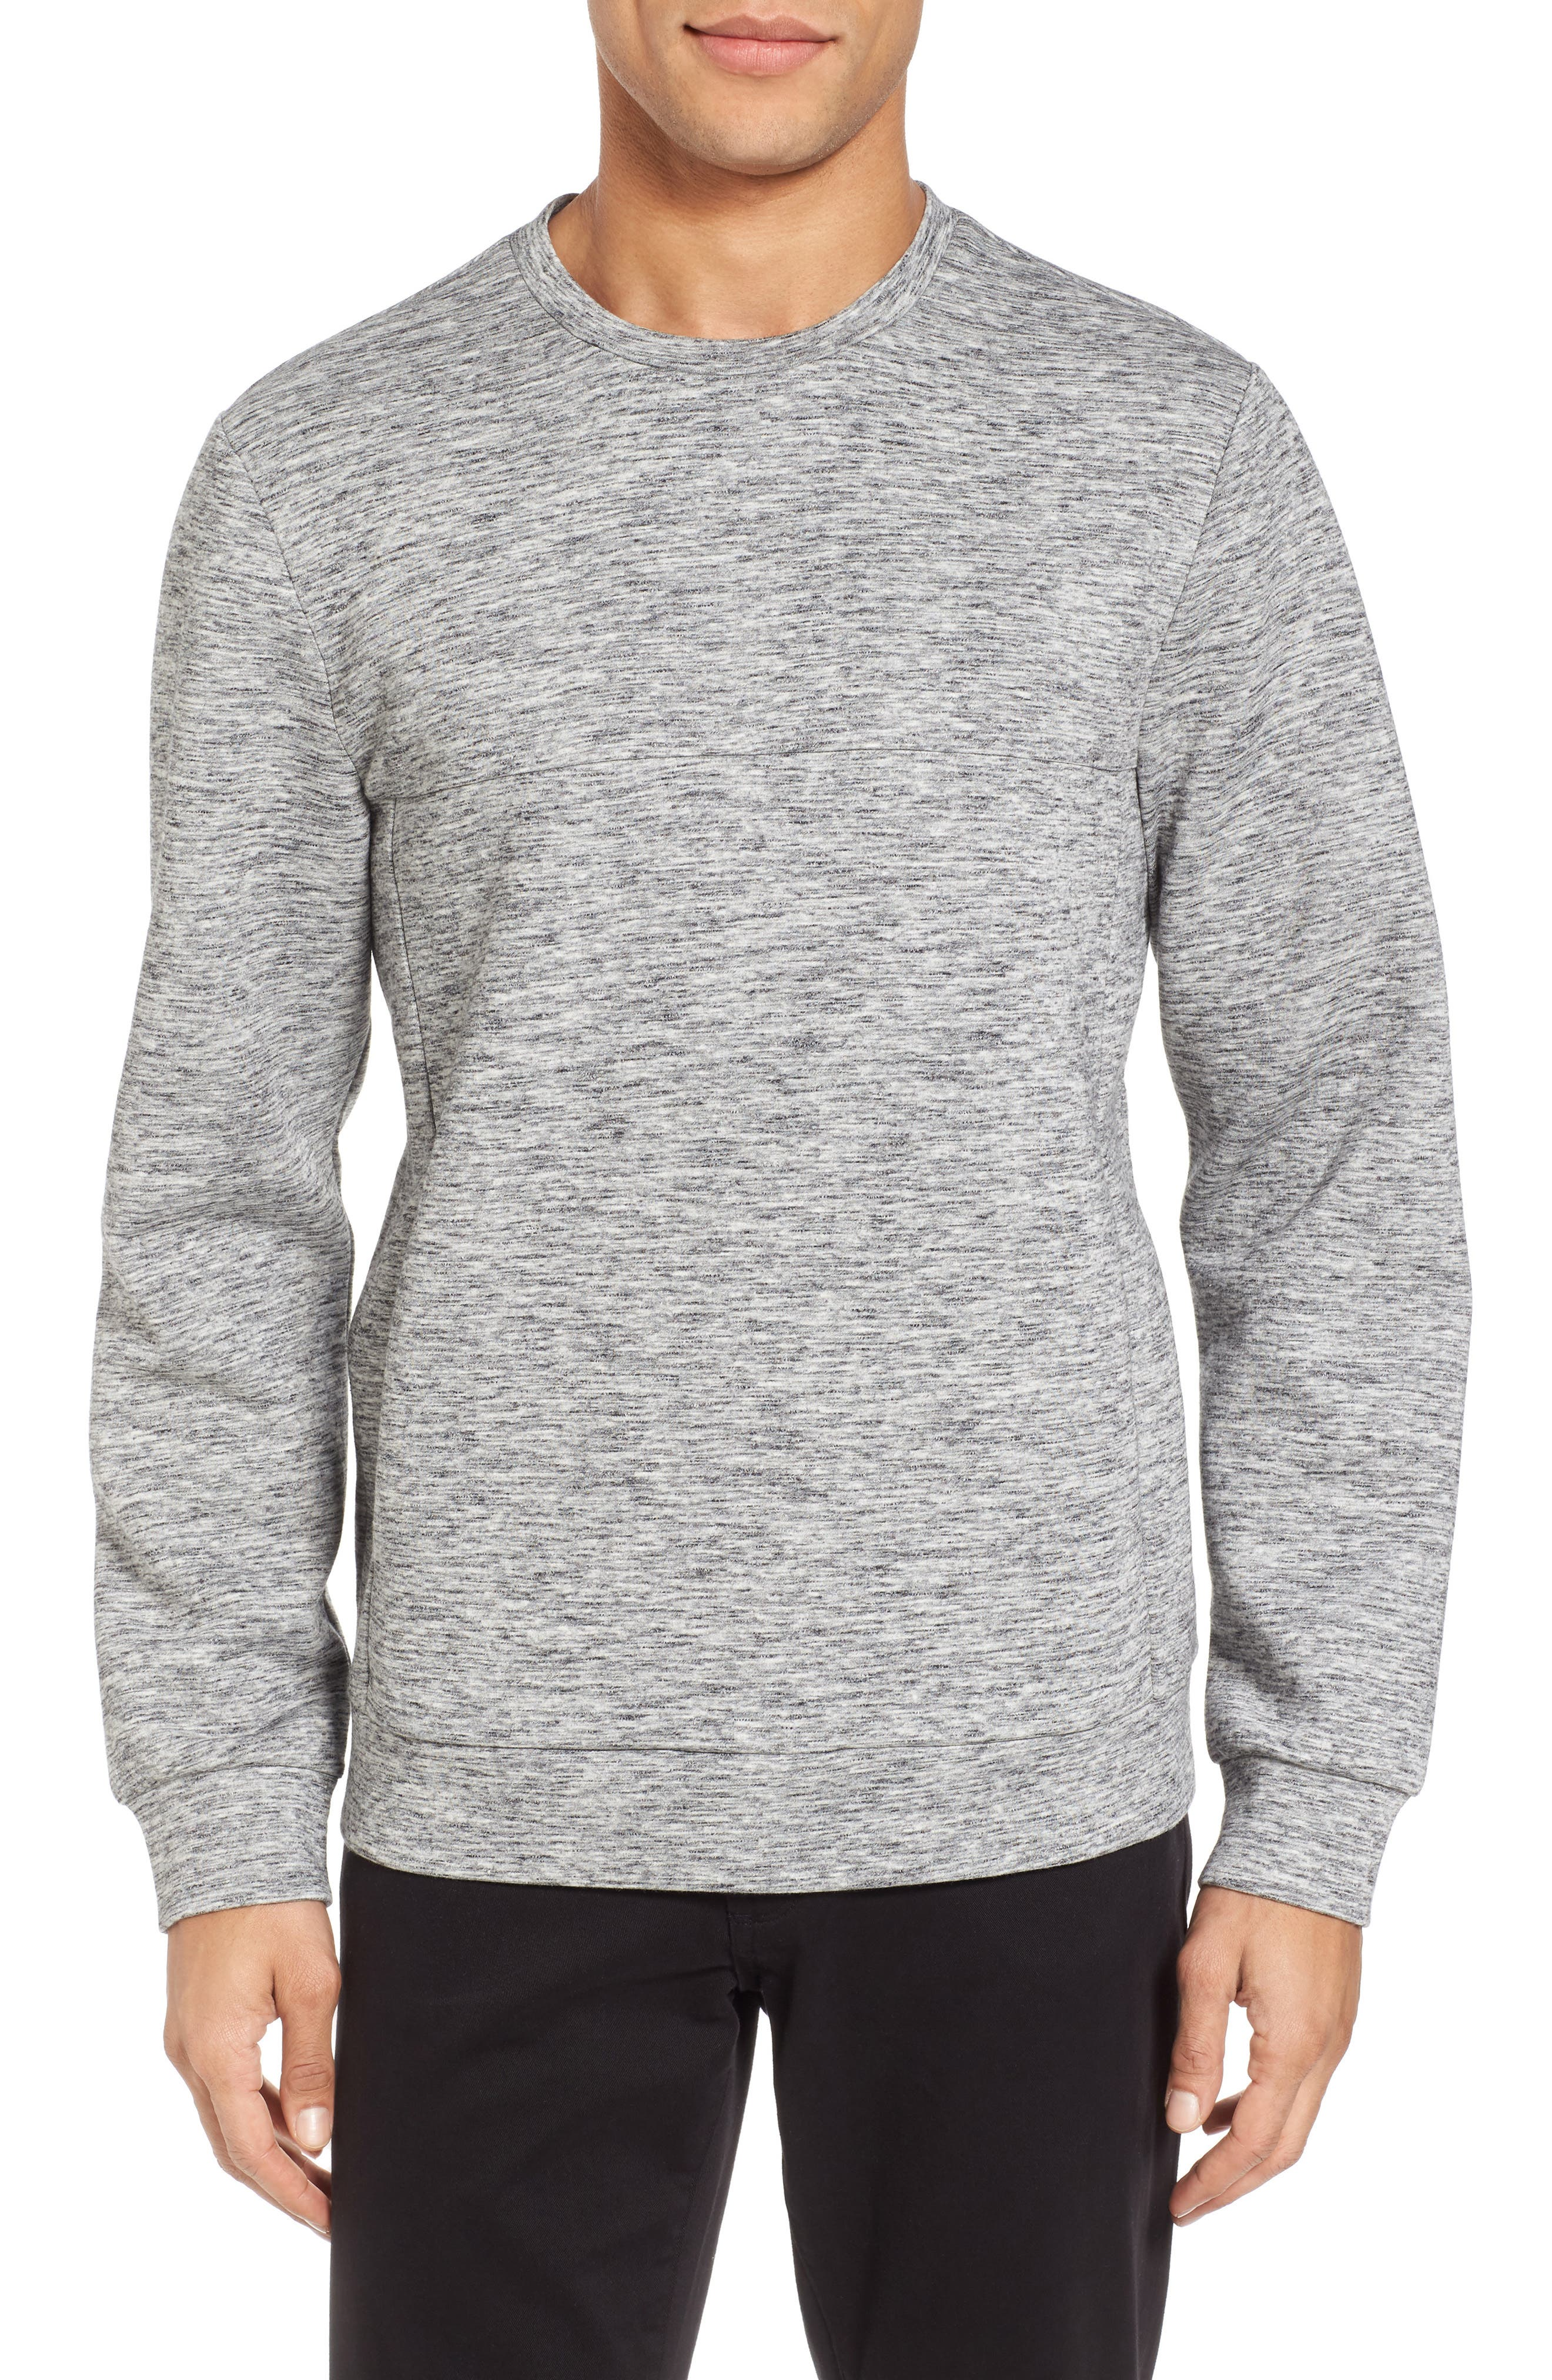 Space Dyed Sweatshirt,                             Main thumbnail 1, color,                             Grey Sleet Jaspe